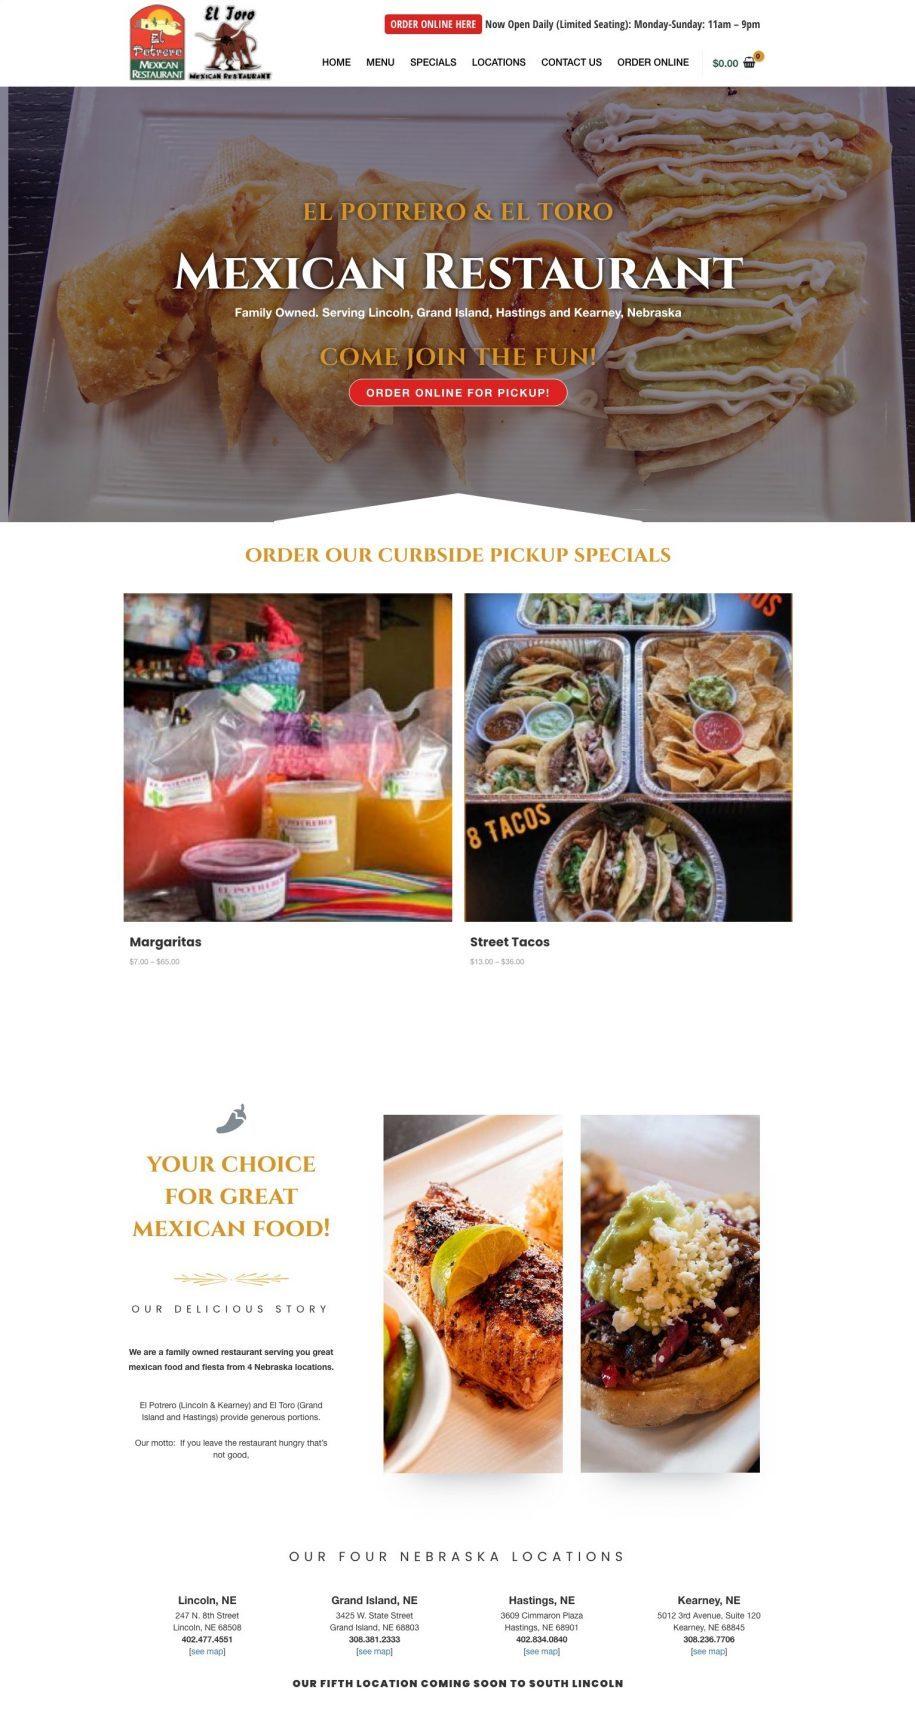 El_Potrero_and_El_Toro_Mexican_Restaurants_–_Come_join_the_fun_